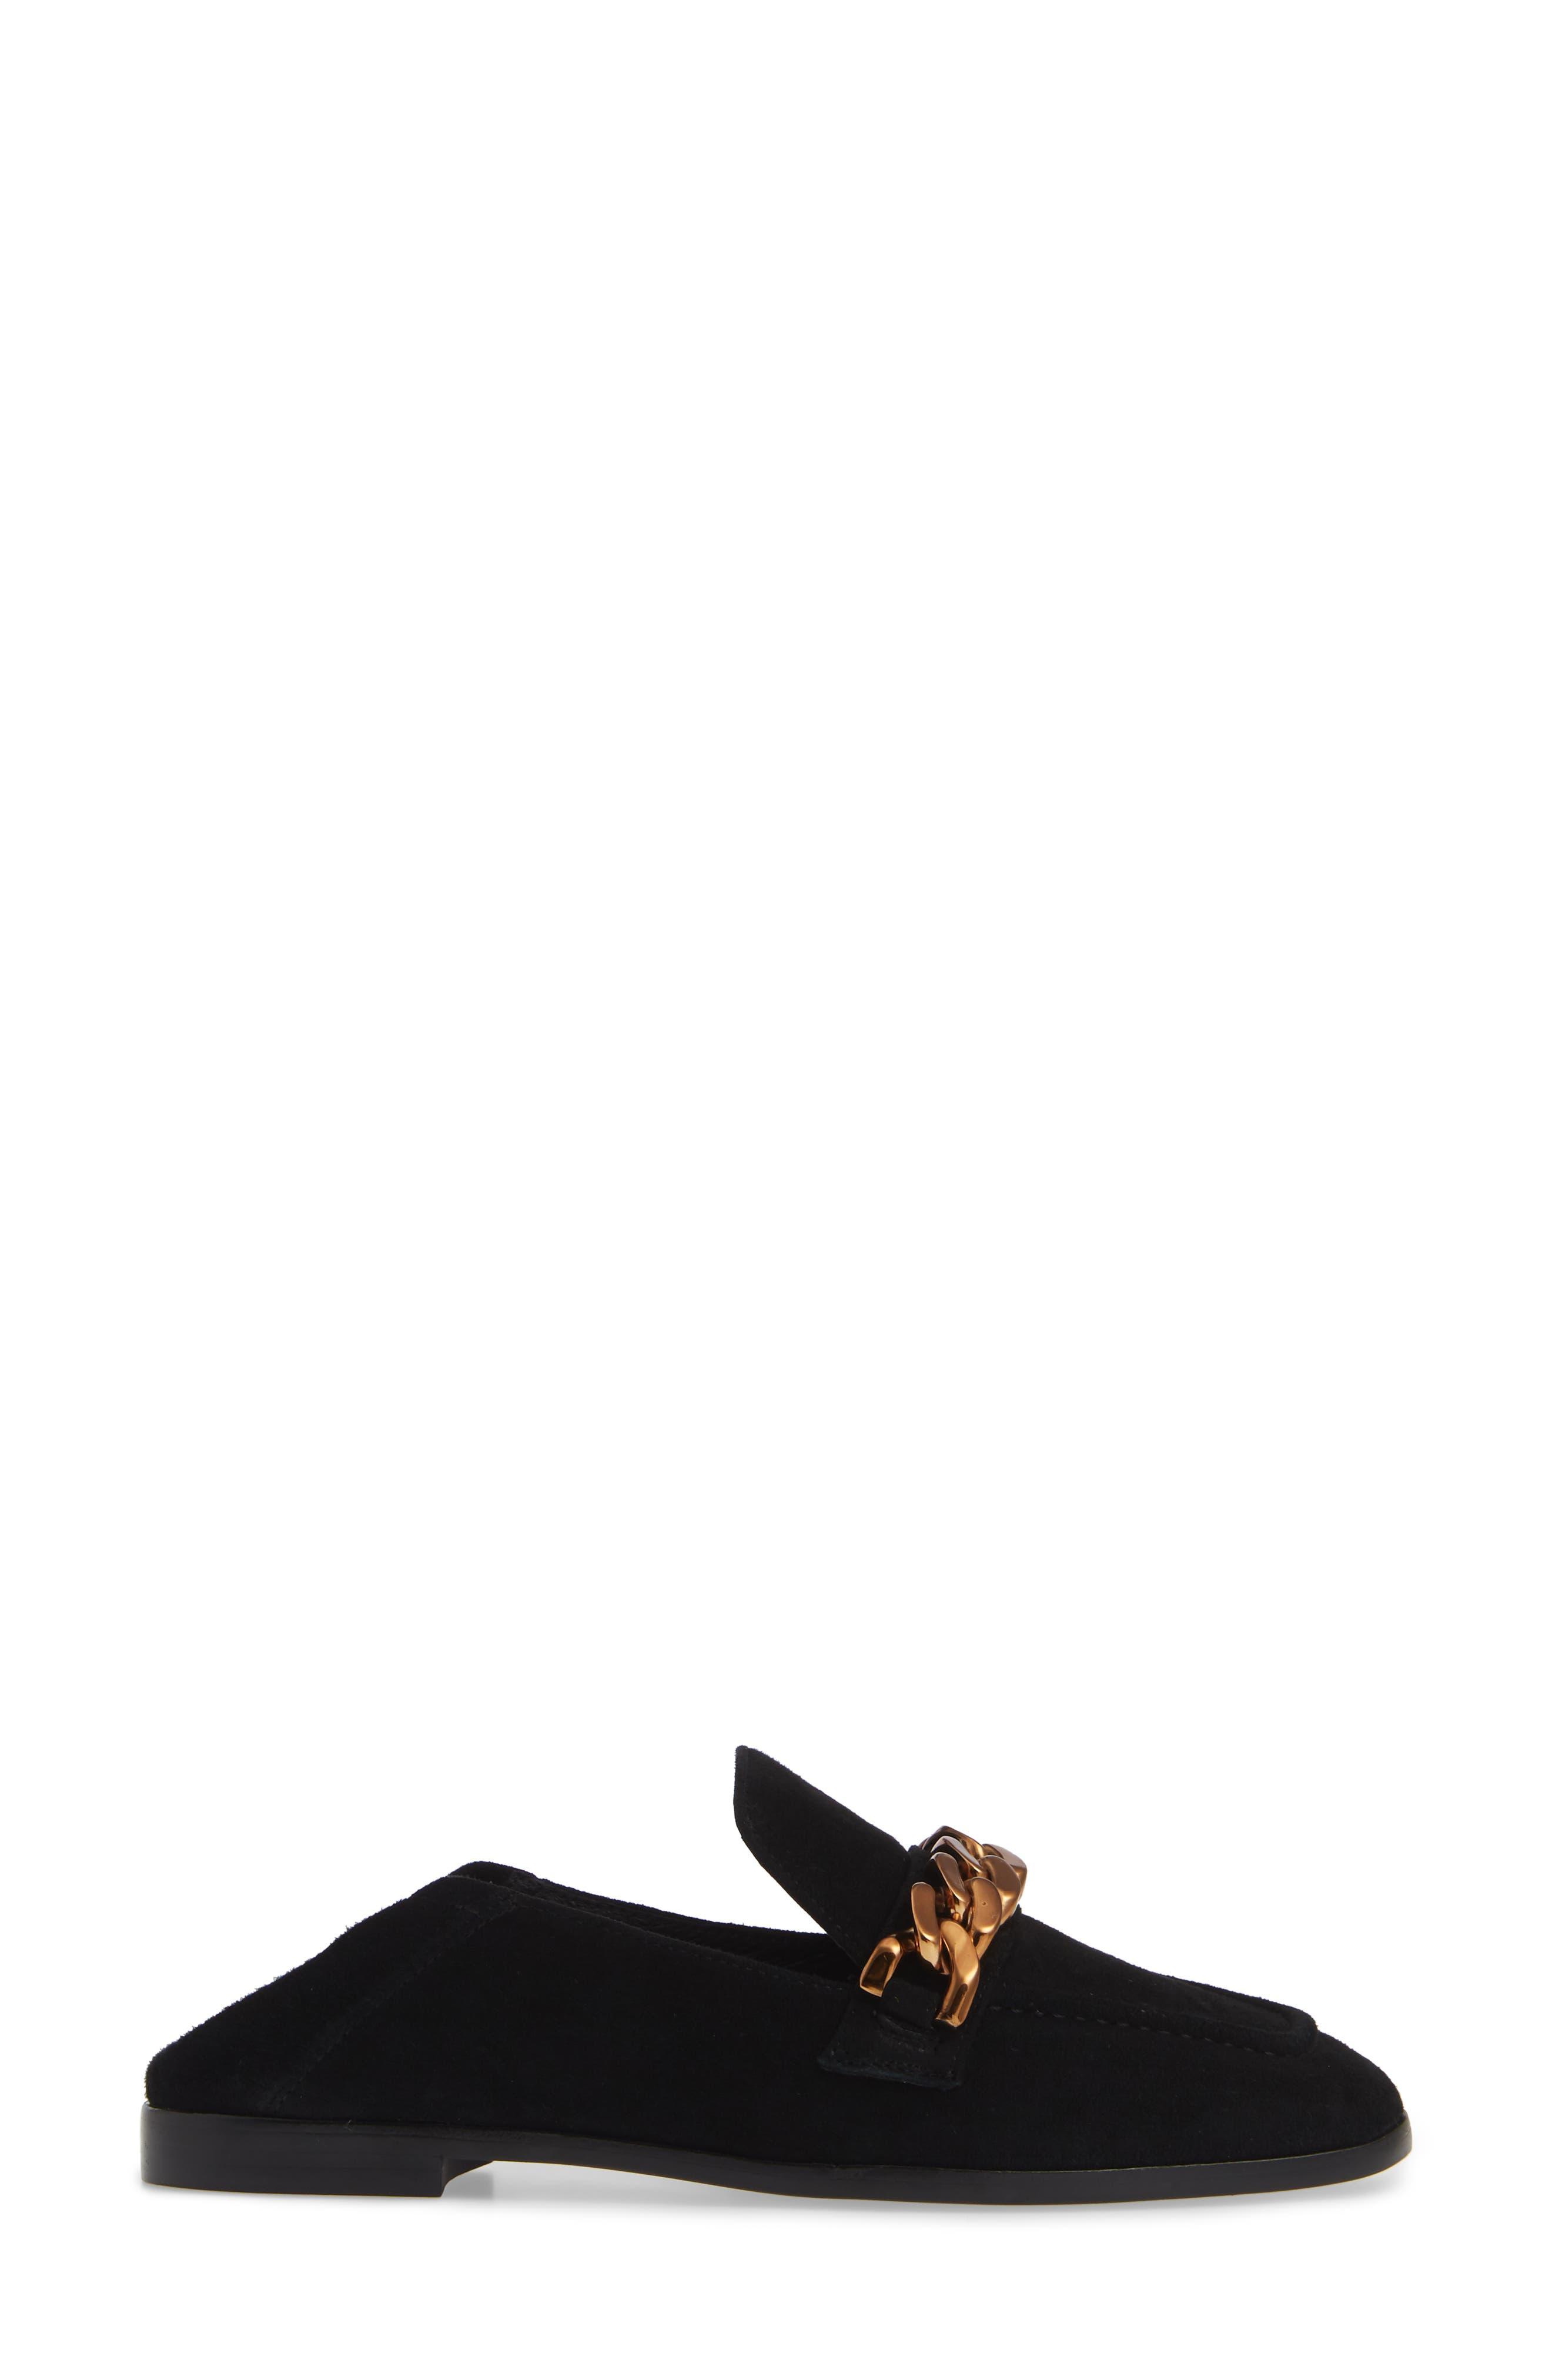 Jesse Convertible Heel Loafer,                             Alternate thumbnail 4, color,                             BLACK SUEDE BRONZE